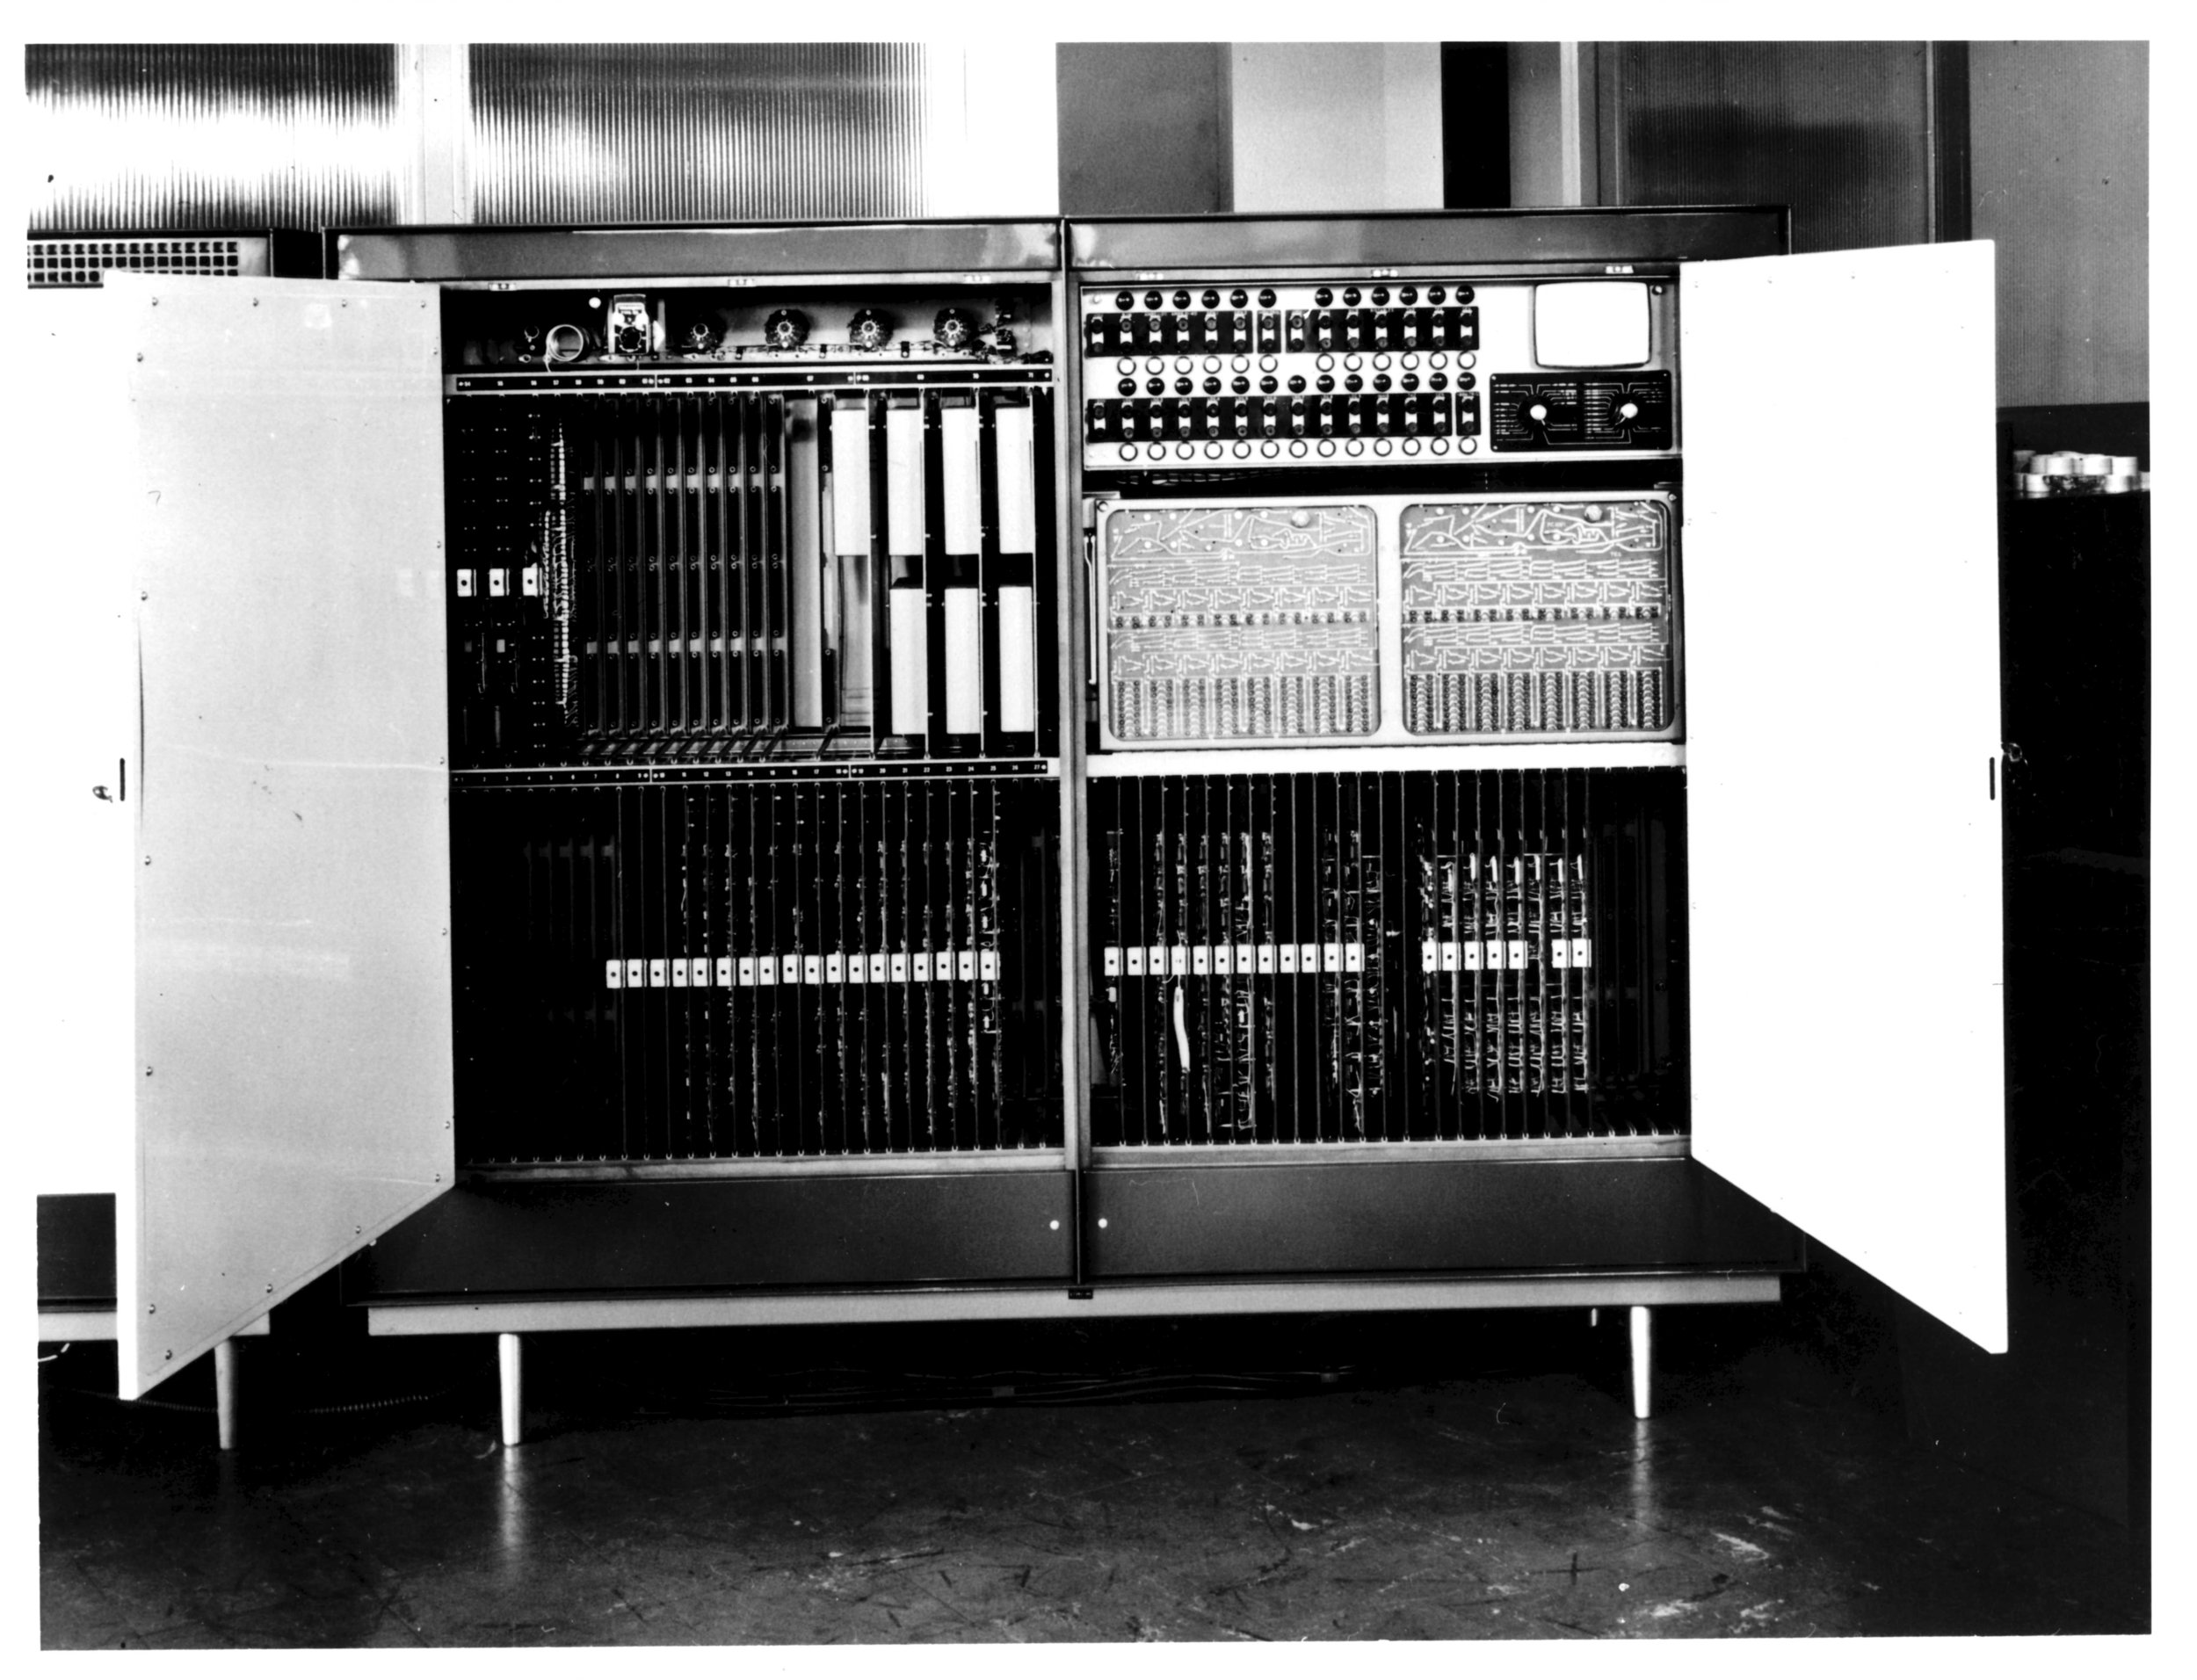 CW-ELLIOTT-006.jpg